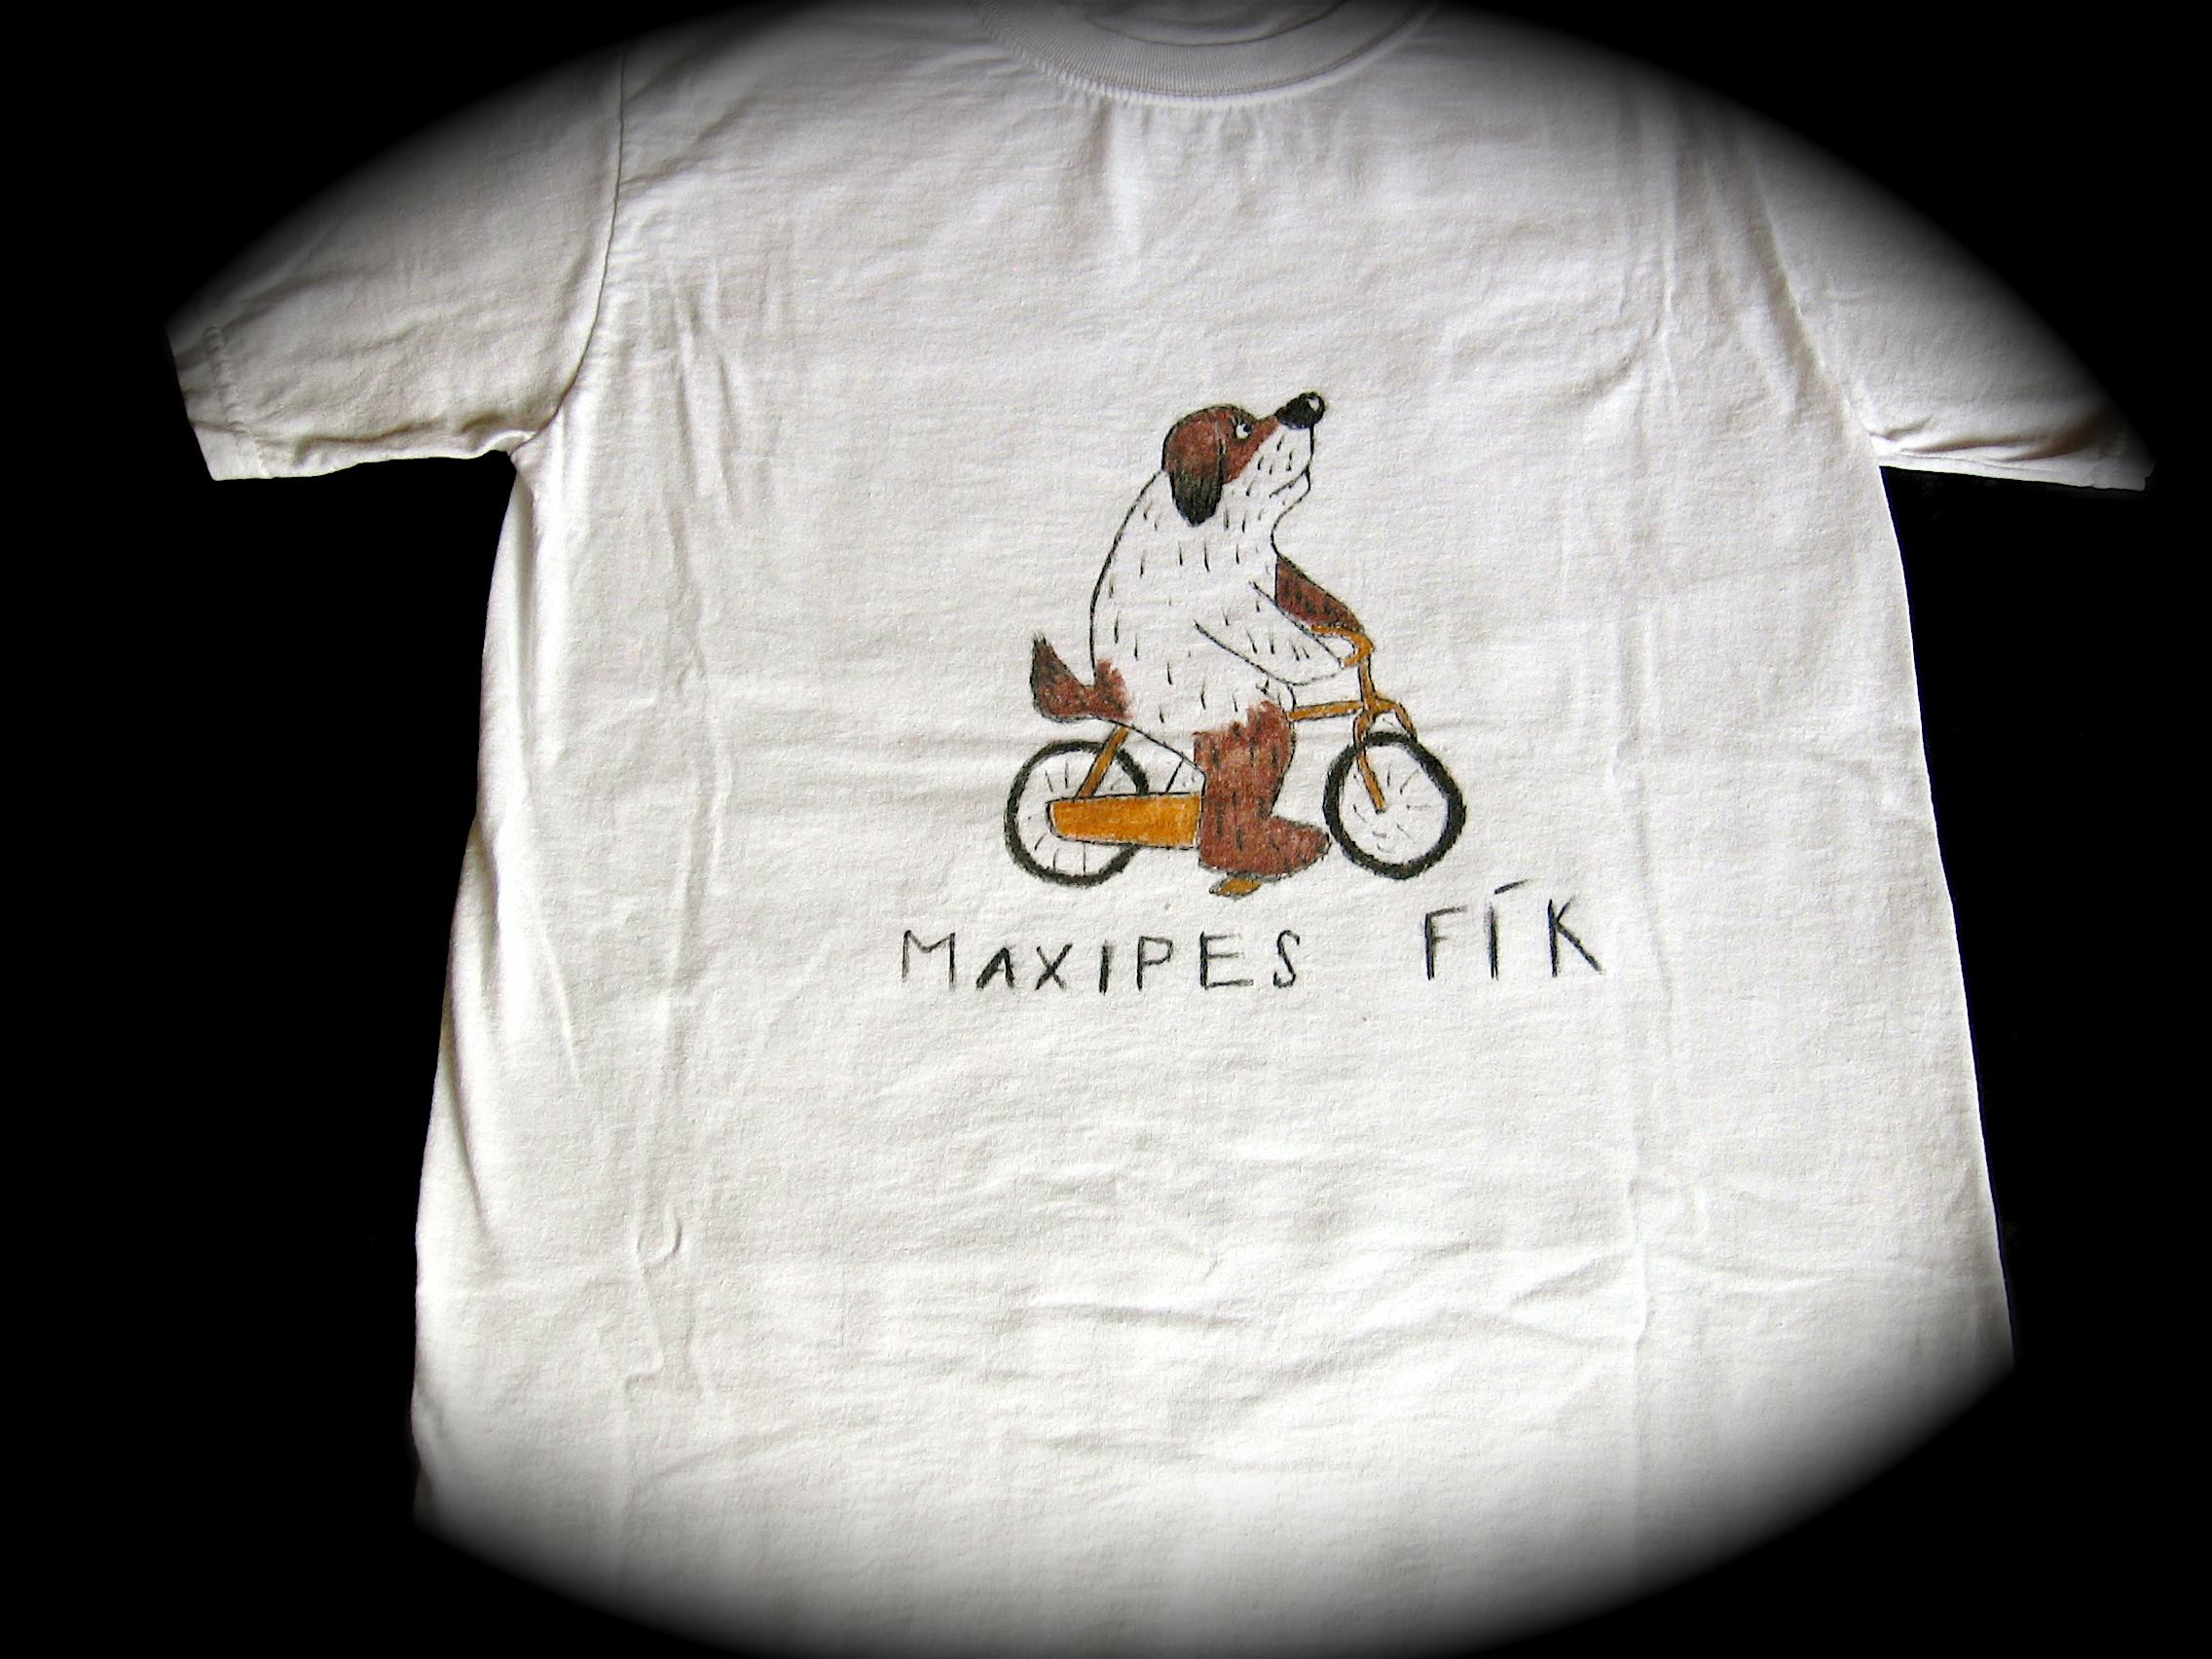 Maxipes Fik T-shirt image